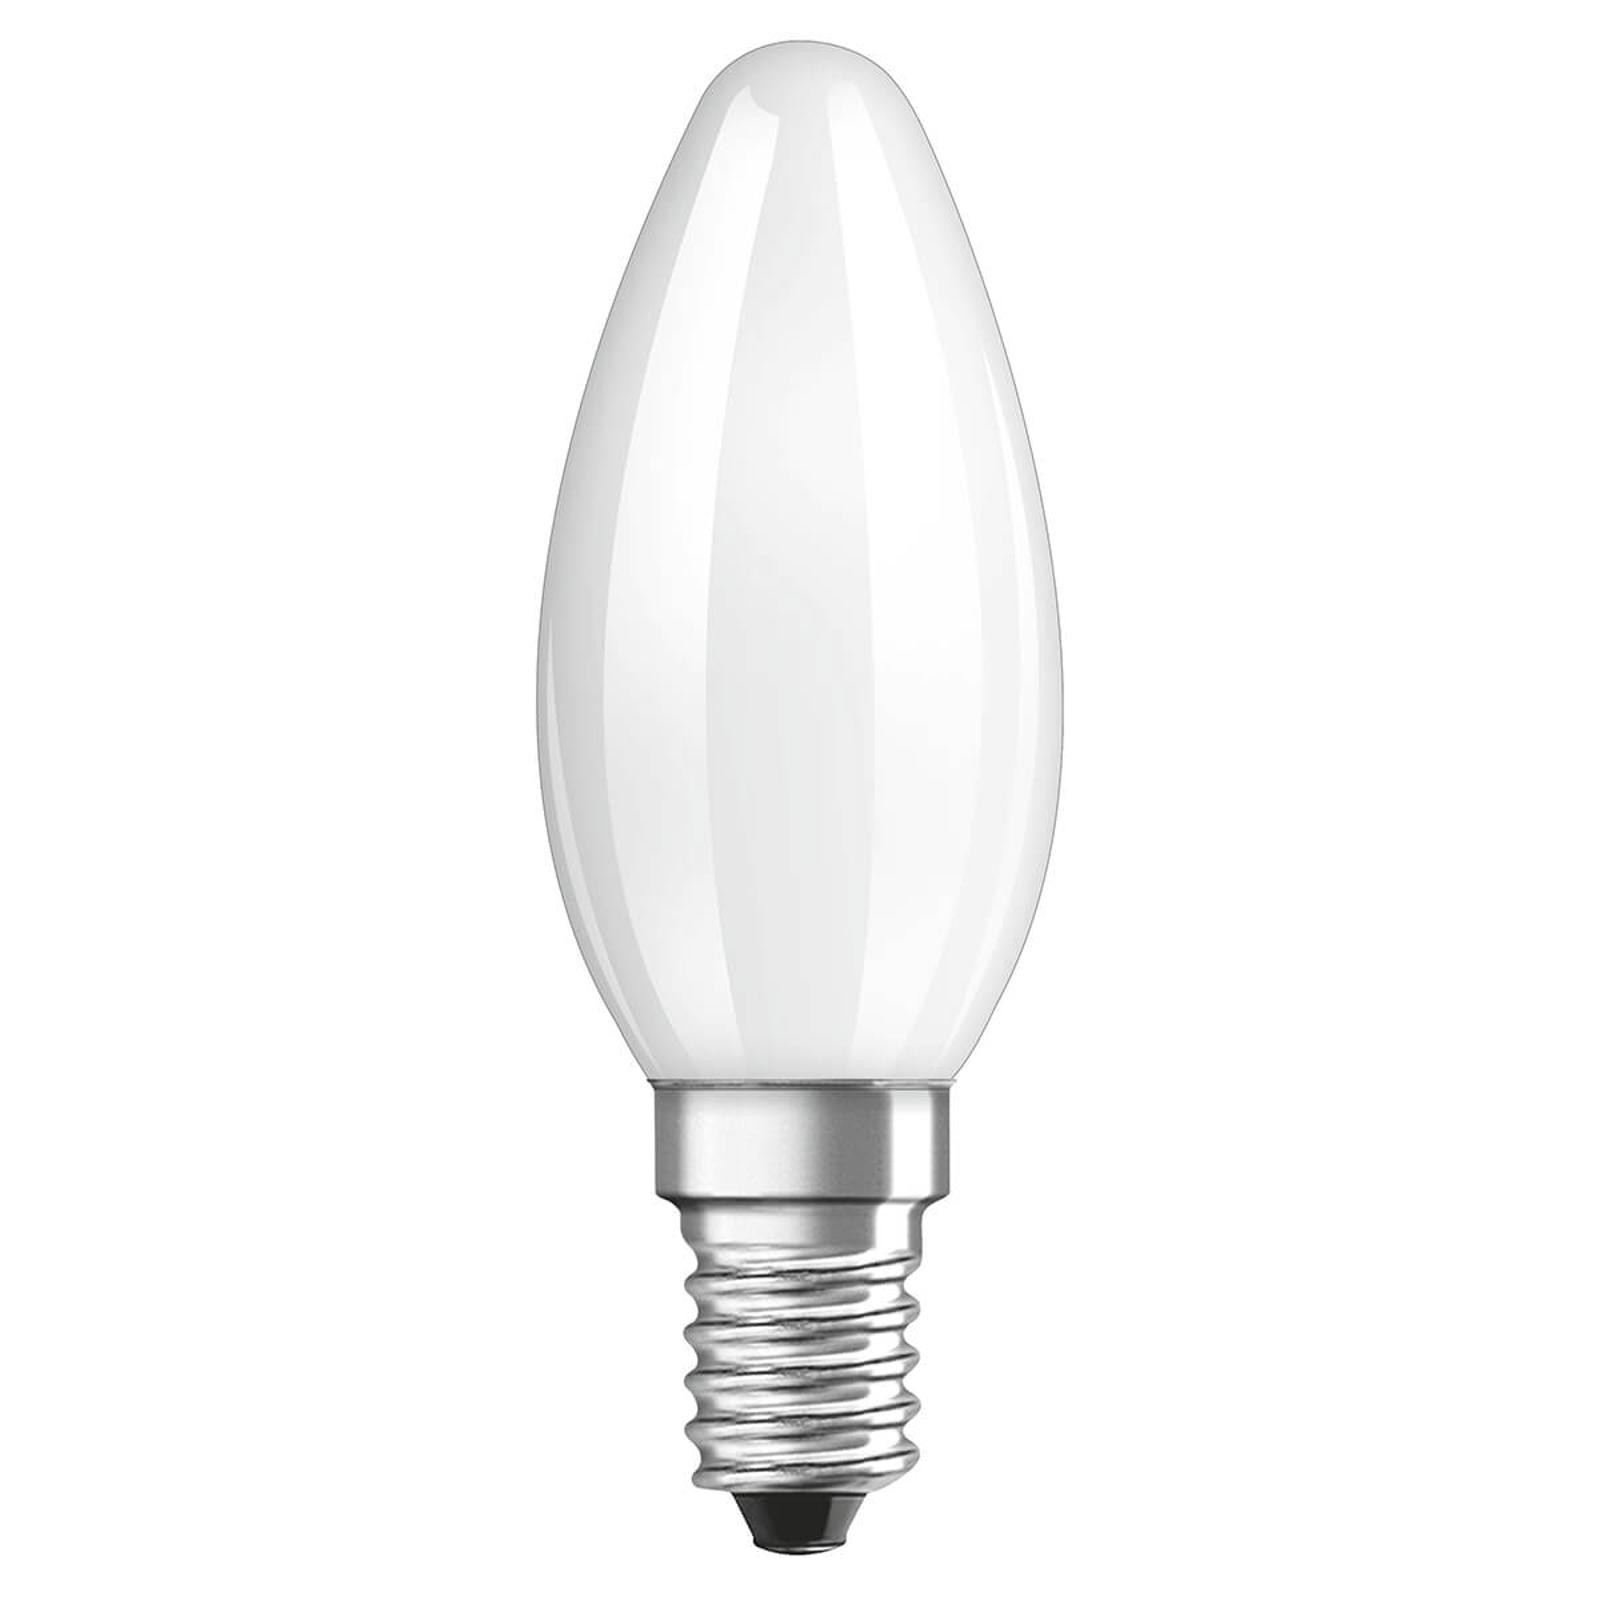 LED-Kerzenlampe E14 4W, tageslicht kaufen